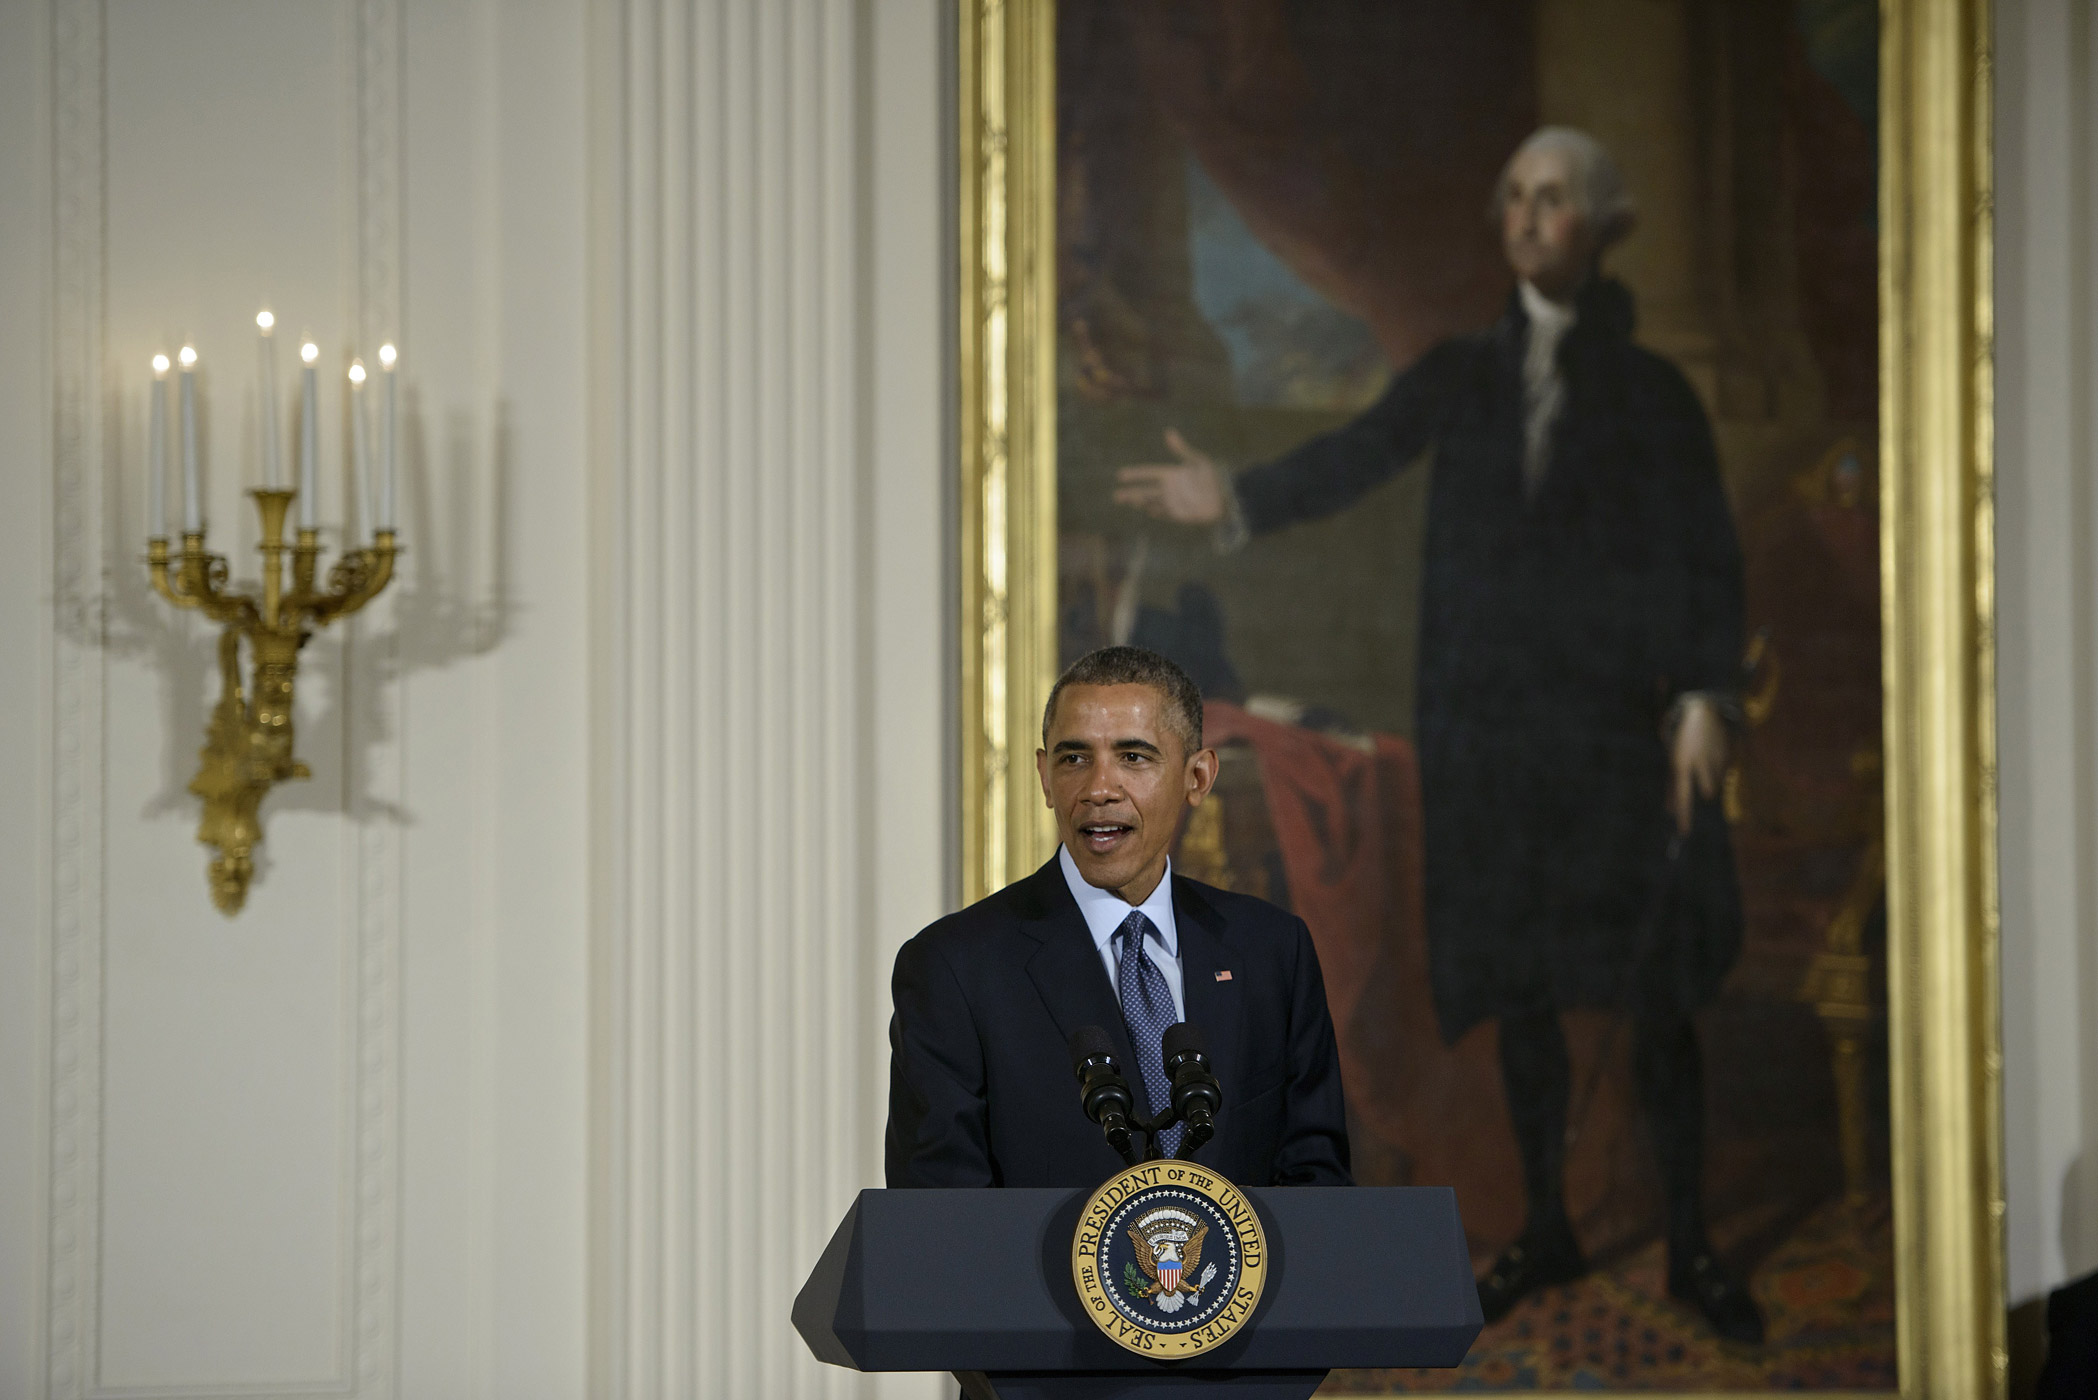 US President Barack Obama speaks during an Easter prayer breakfast in the East Room of the White House April 7, 2015 in Washington, DC.